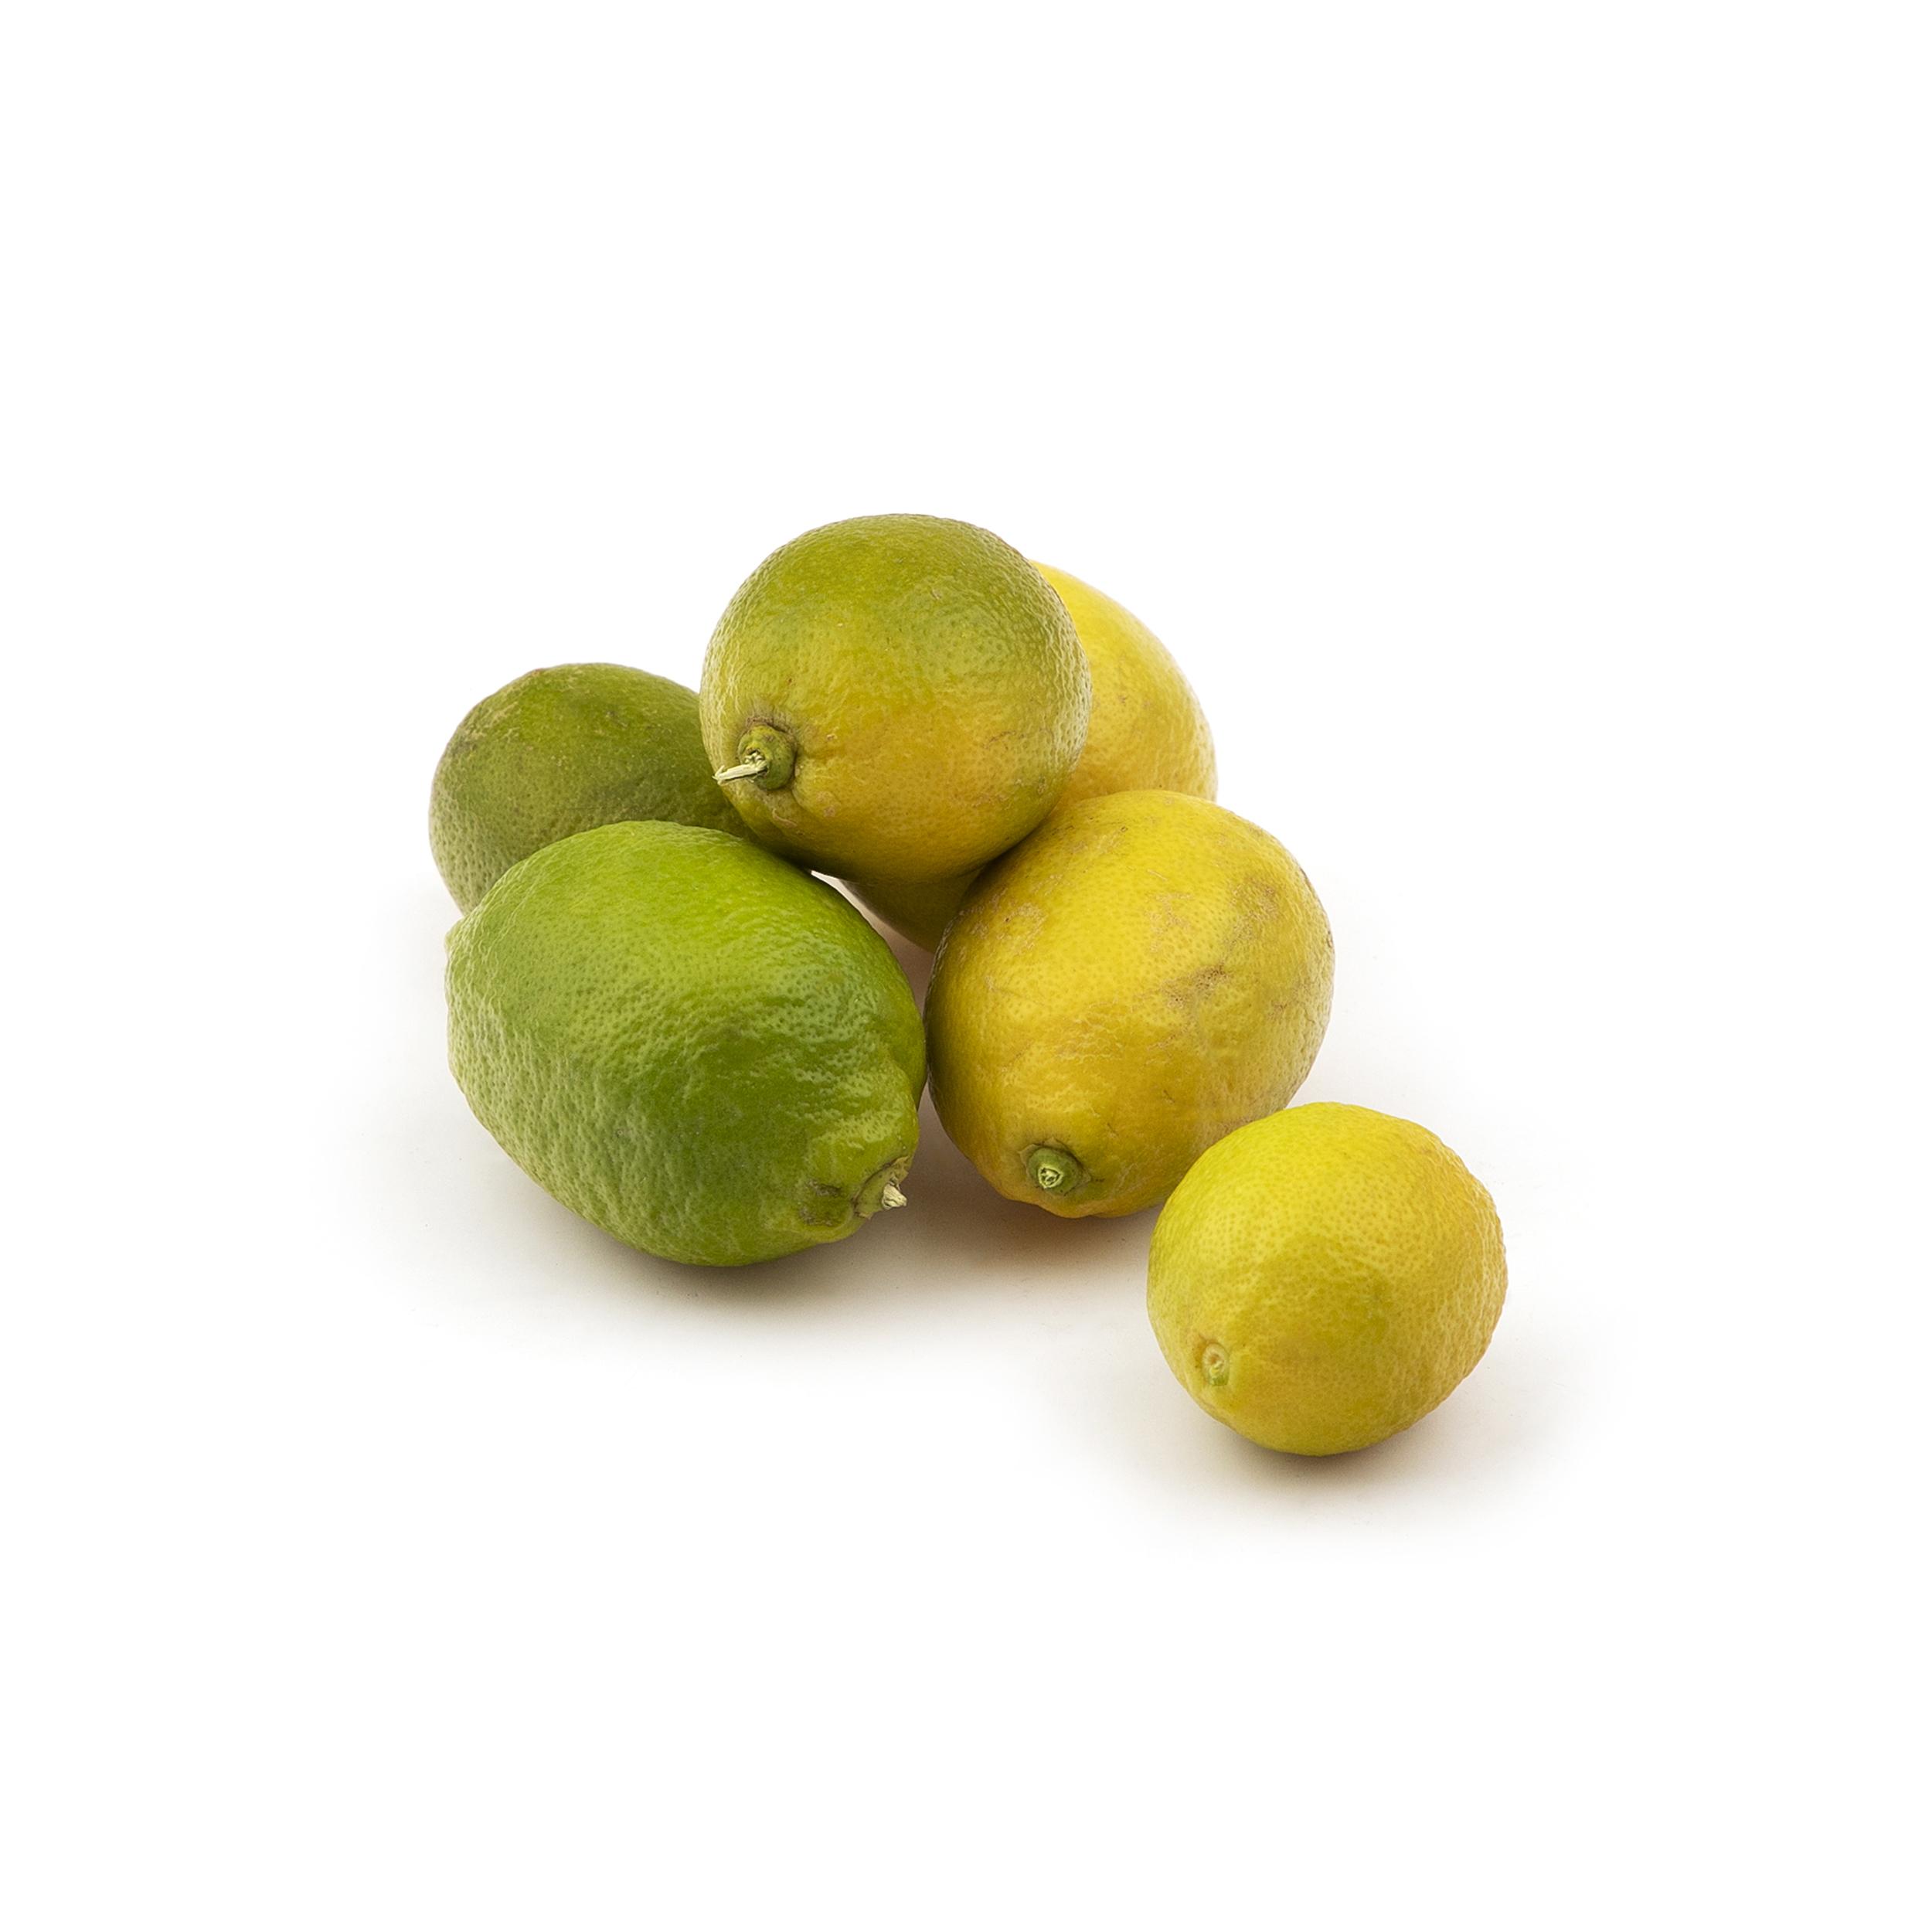 لیمو ترش سنگی Fresh مقدار 500 گرم